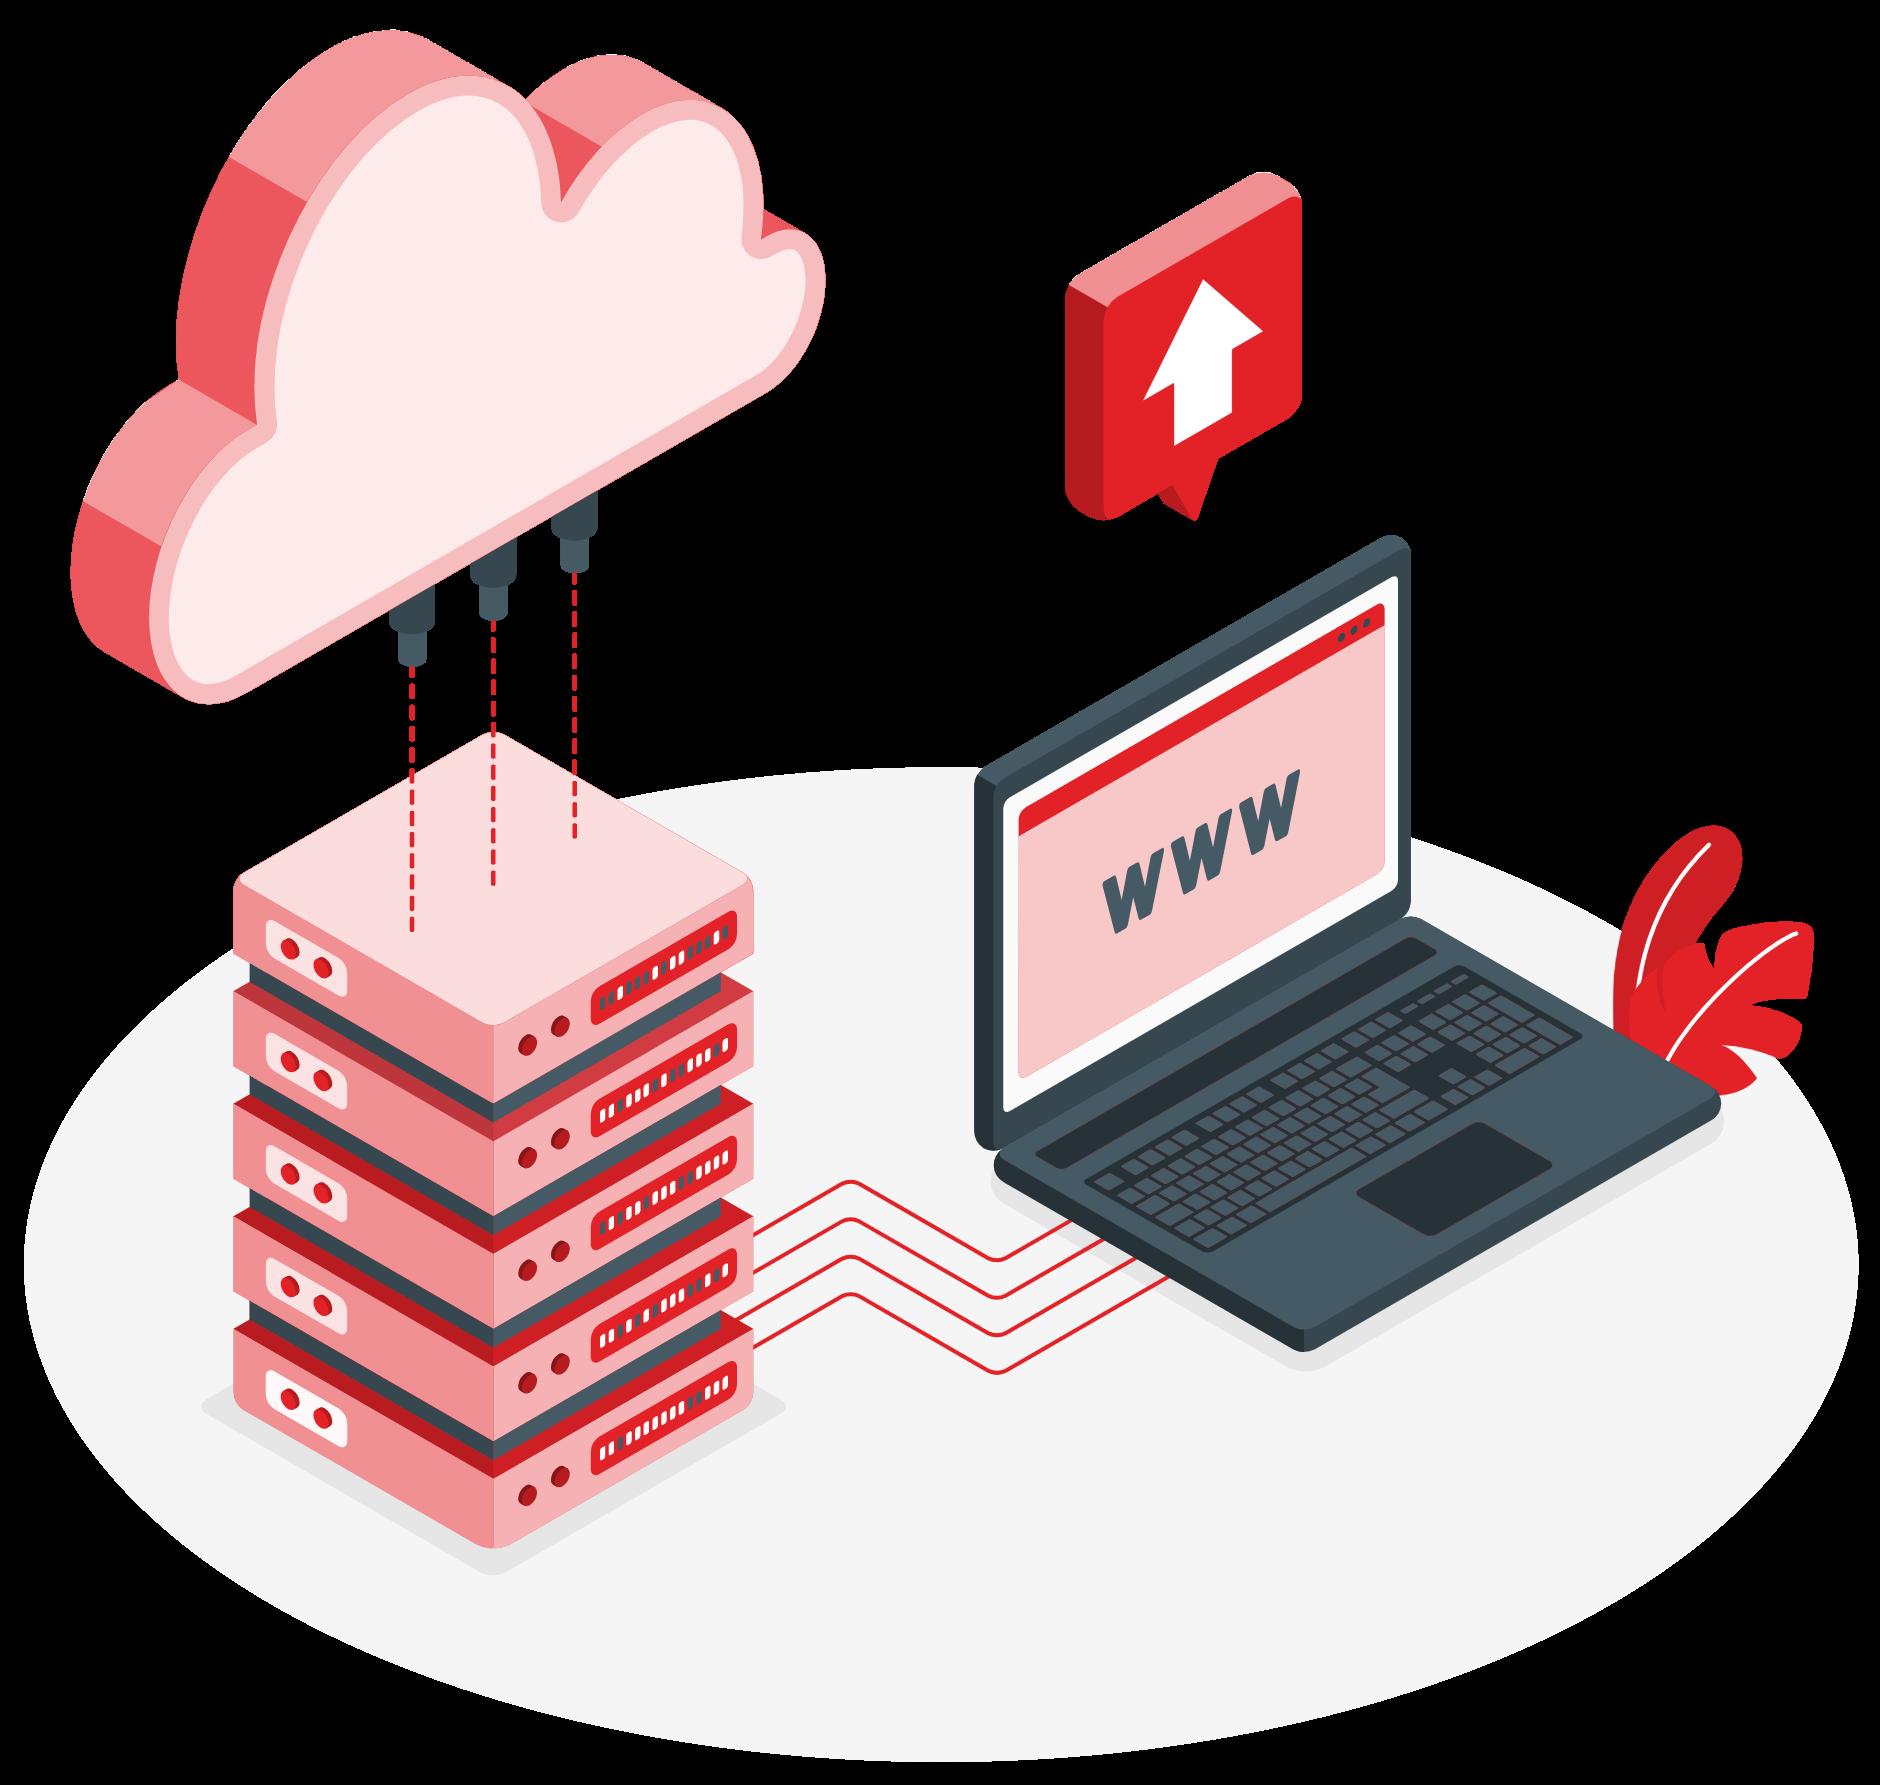 Servicio CloudOps